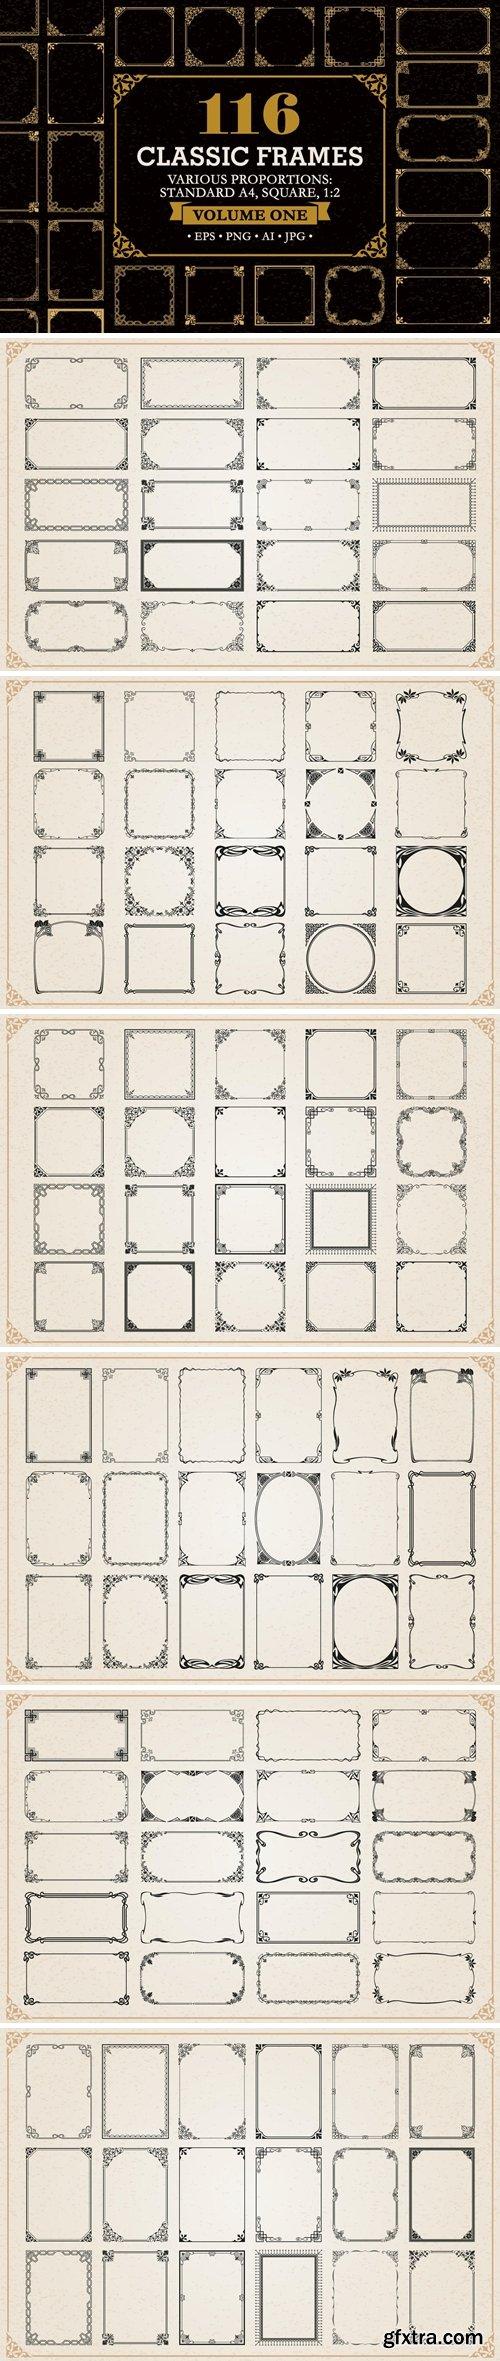 Decorative frames and borders set #1, 116 Elements